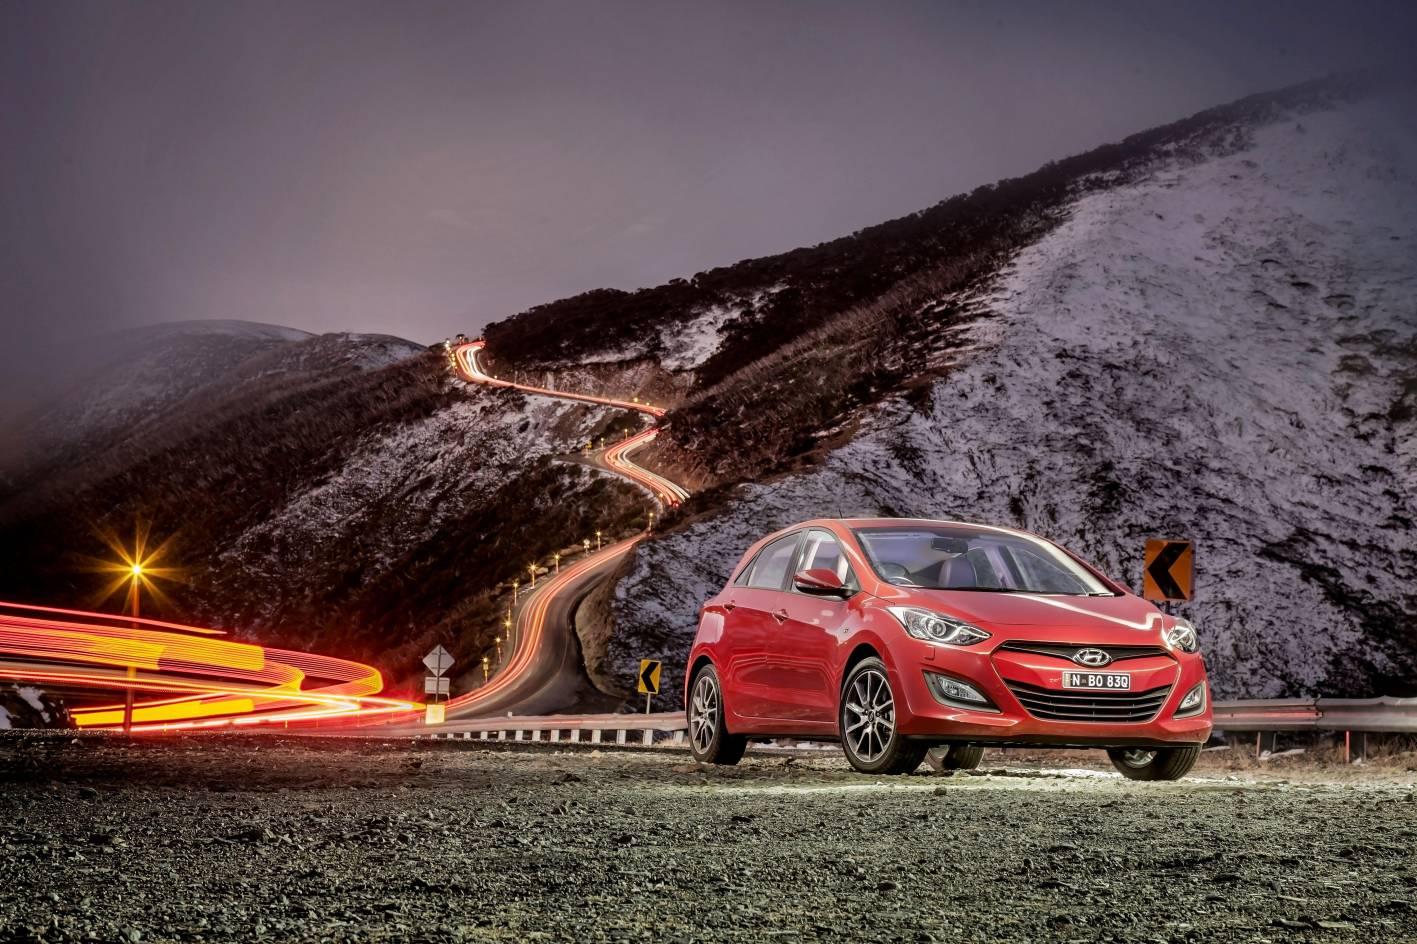 Hyundai i30 - no recalls in the history of the badge